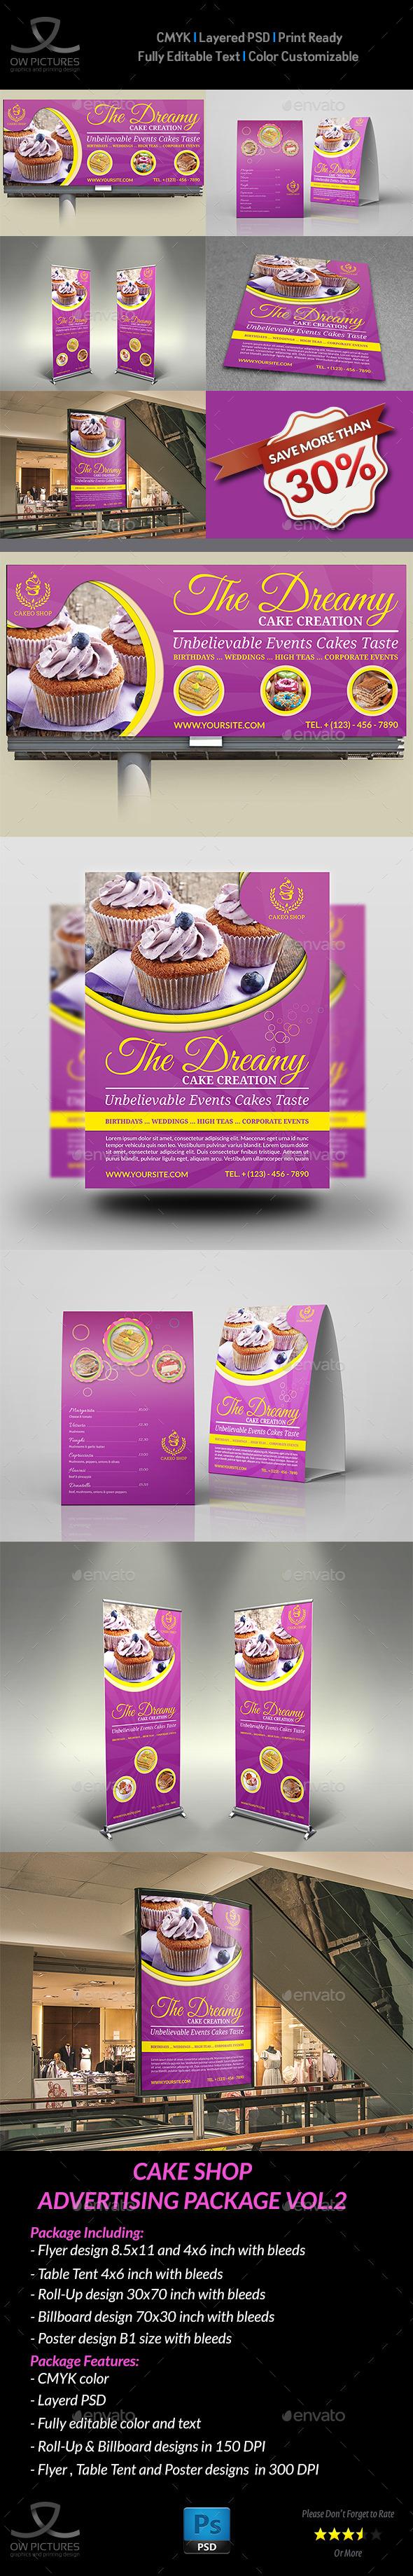 Cake Shop Advertising Bundle Vol.2 - Signage Print Templates